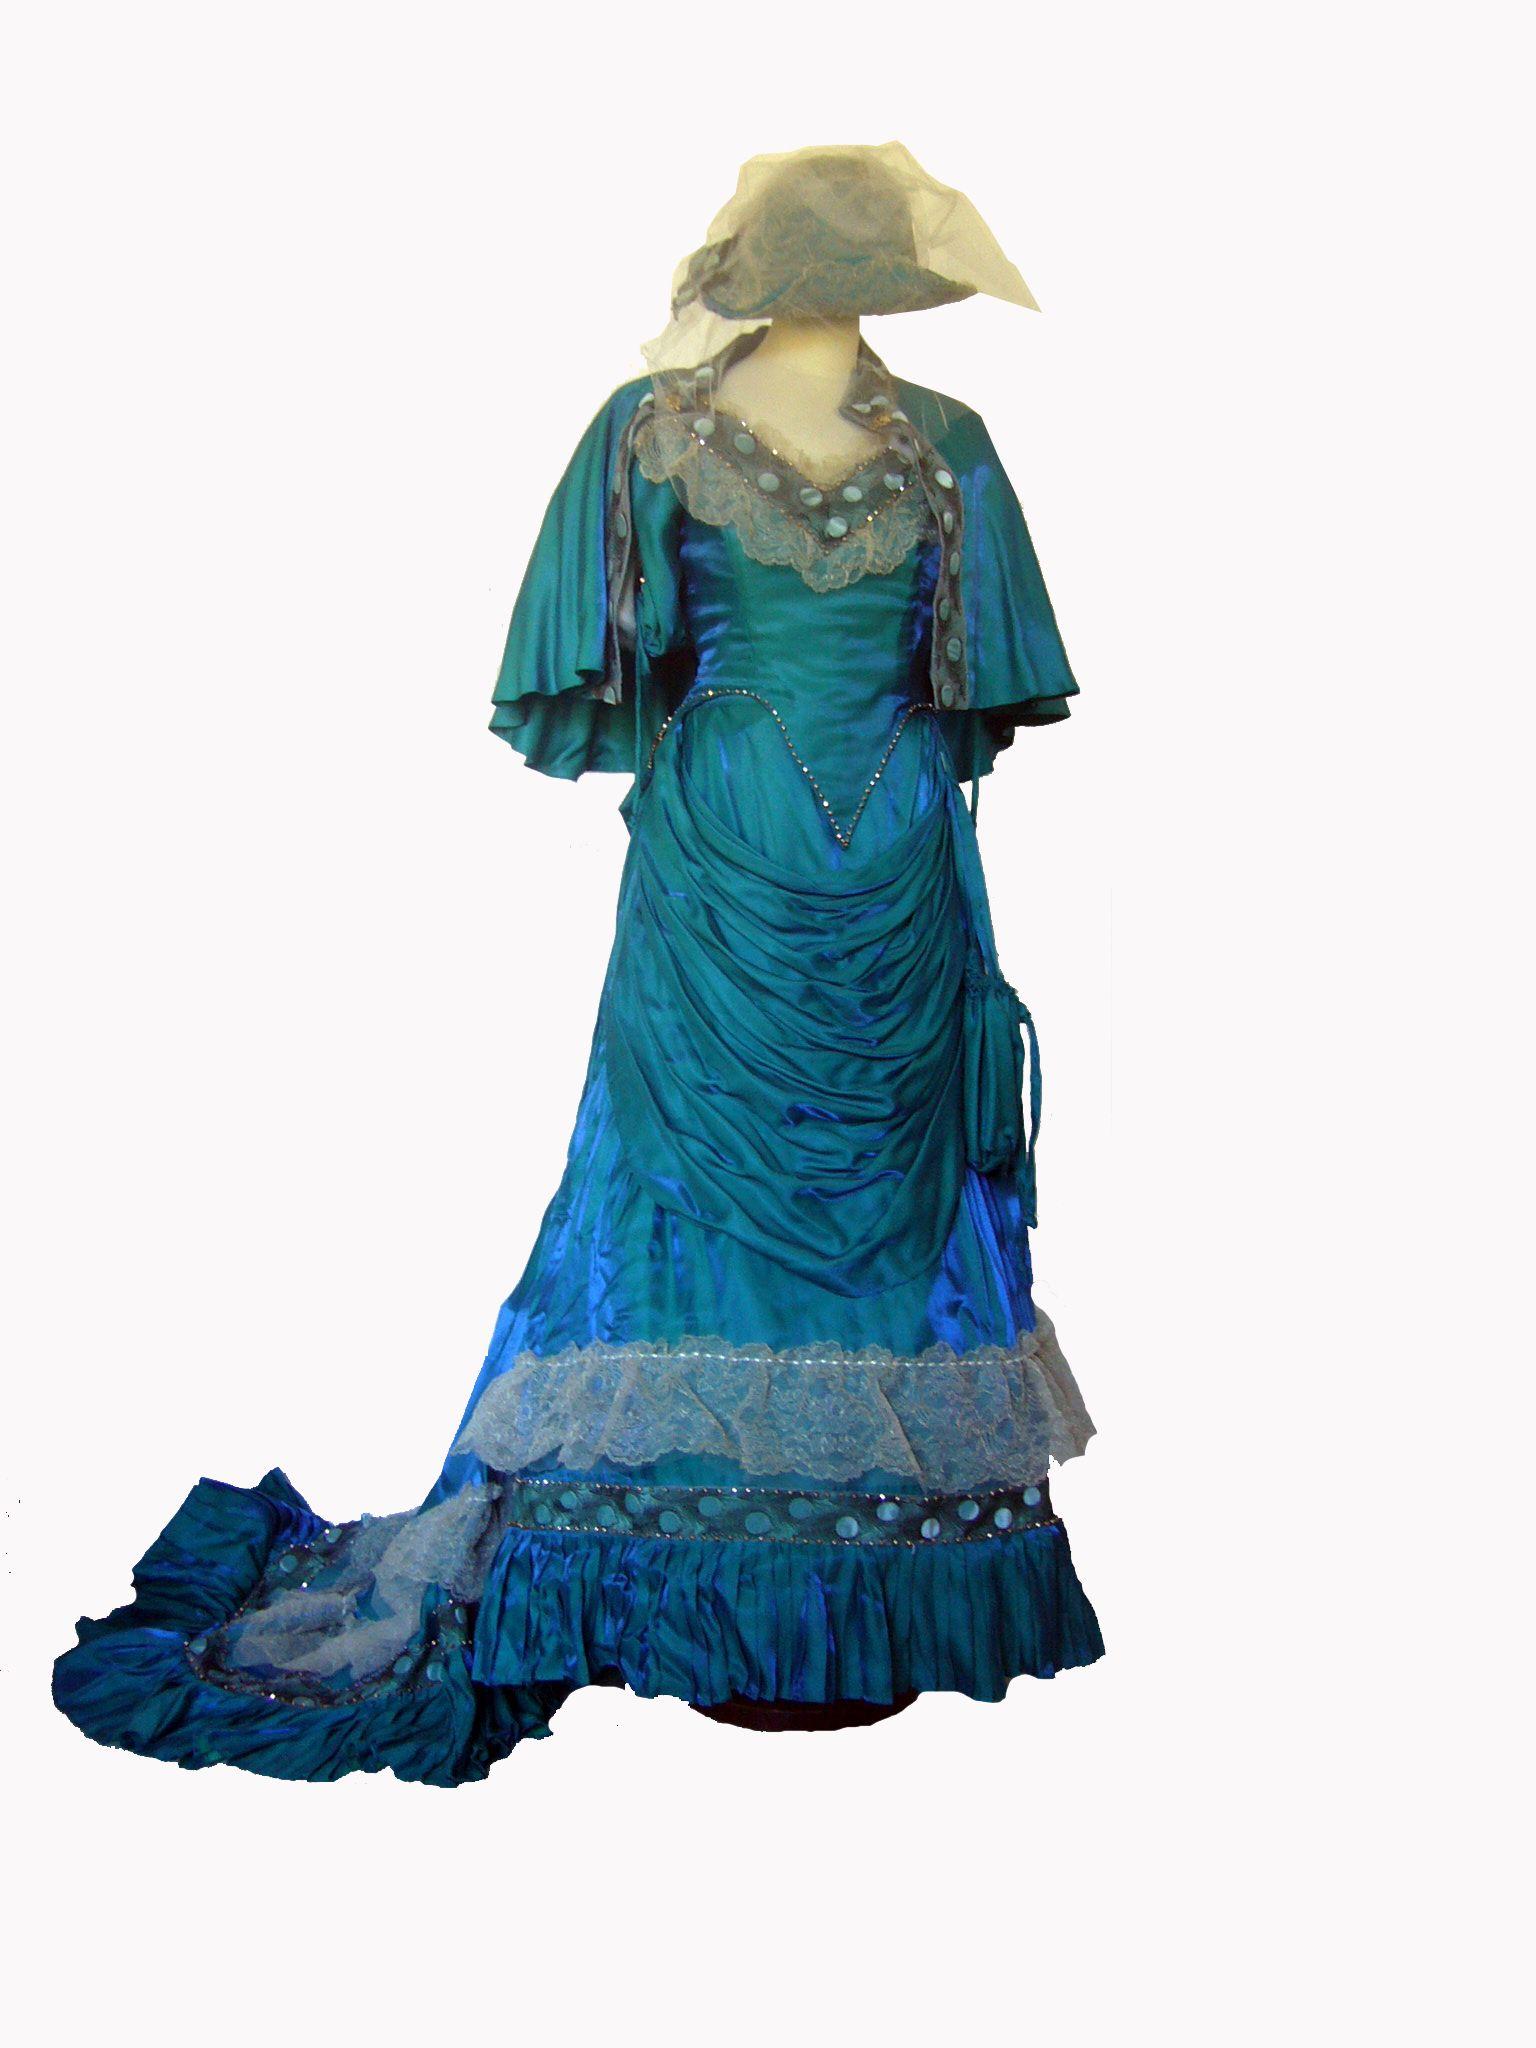 Venice Atelier historical costume 1800s #historical #costume #dress #carnival #1800s & Venice Atelier: historical costume 1800s #historical #costume #dress ...